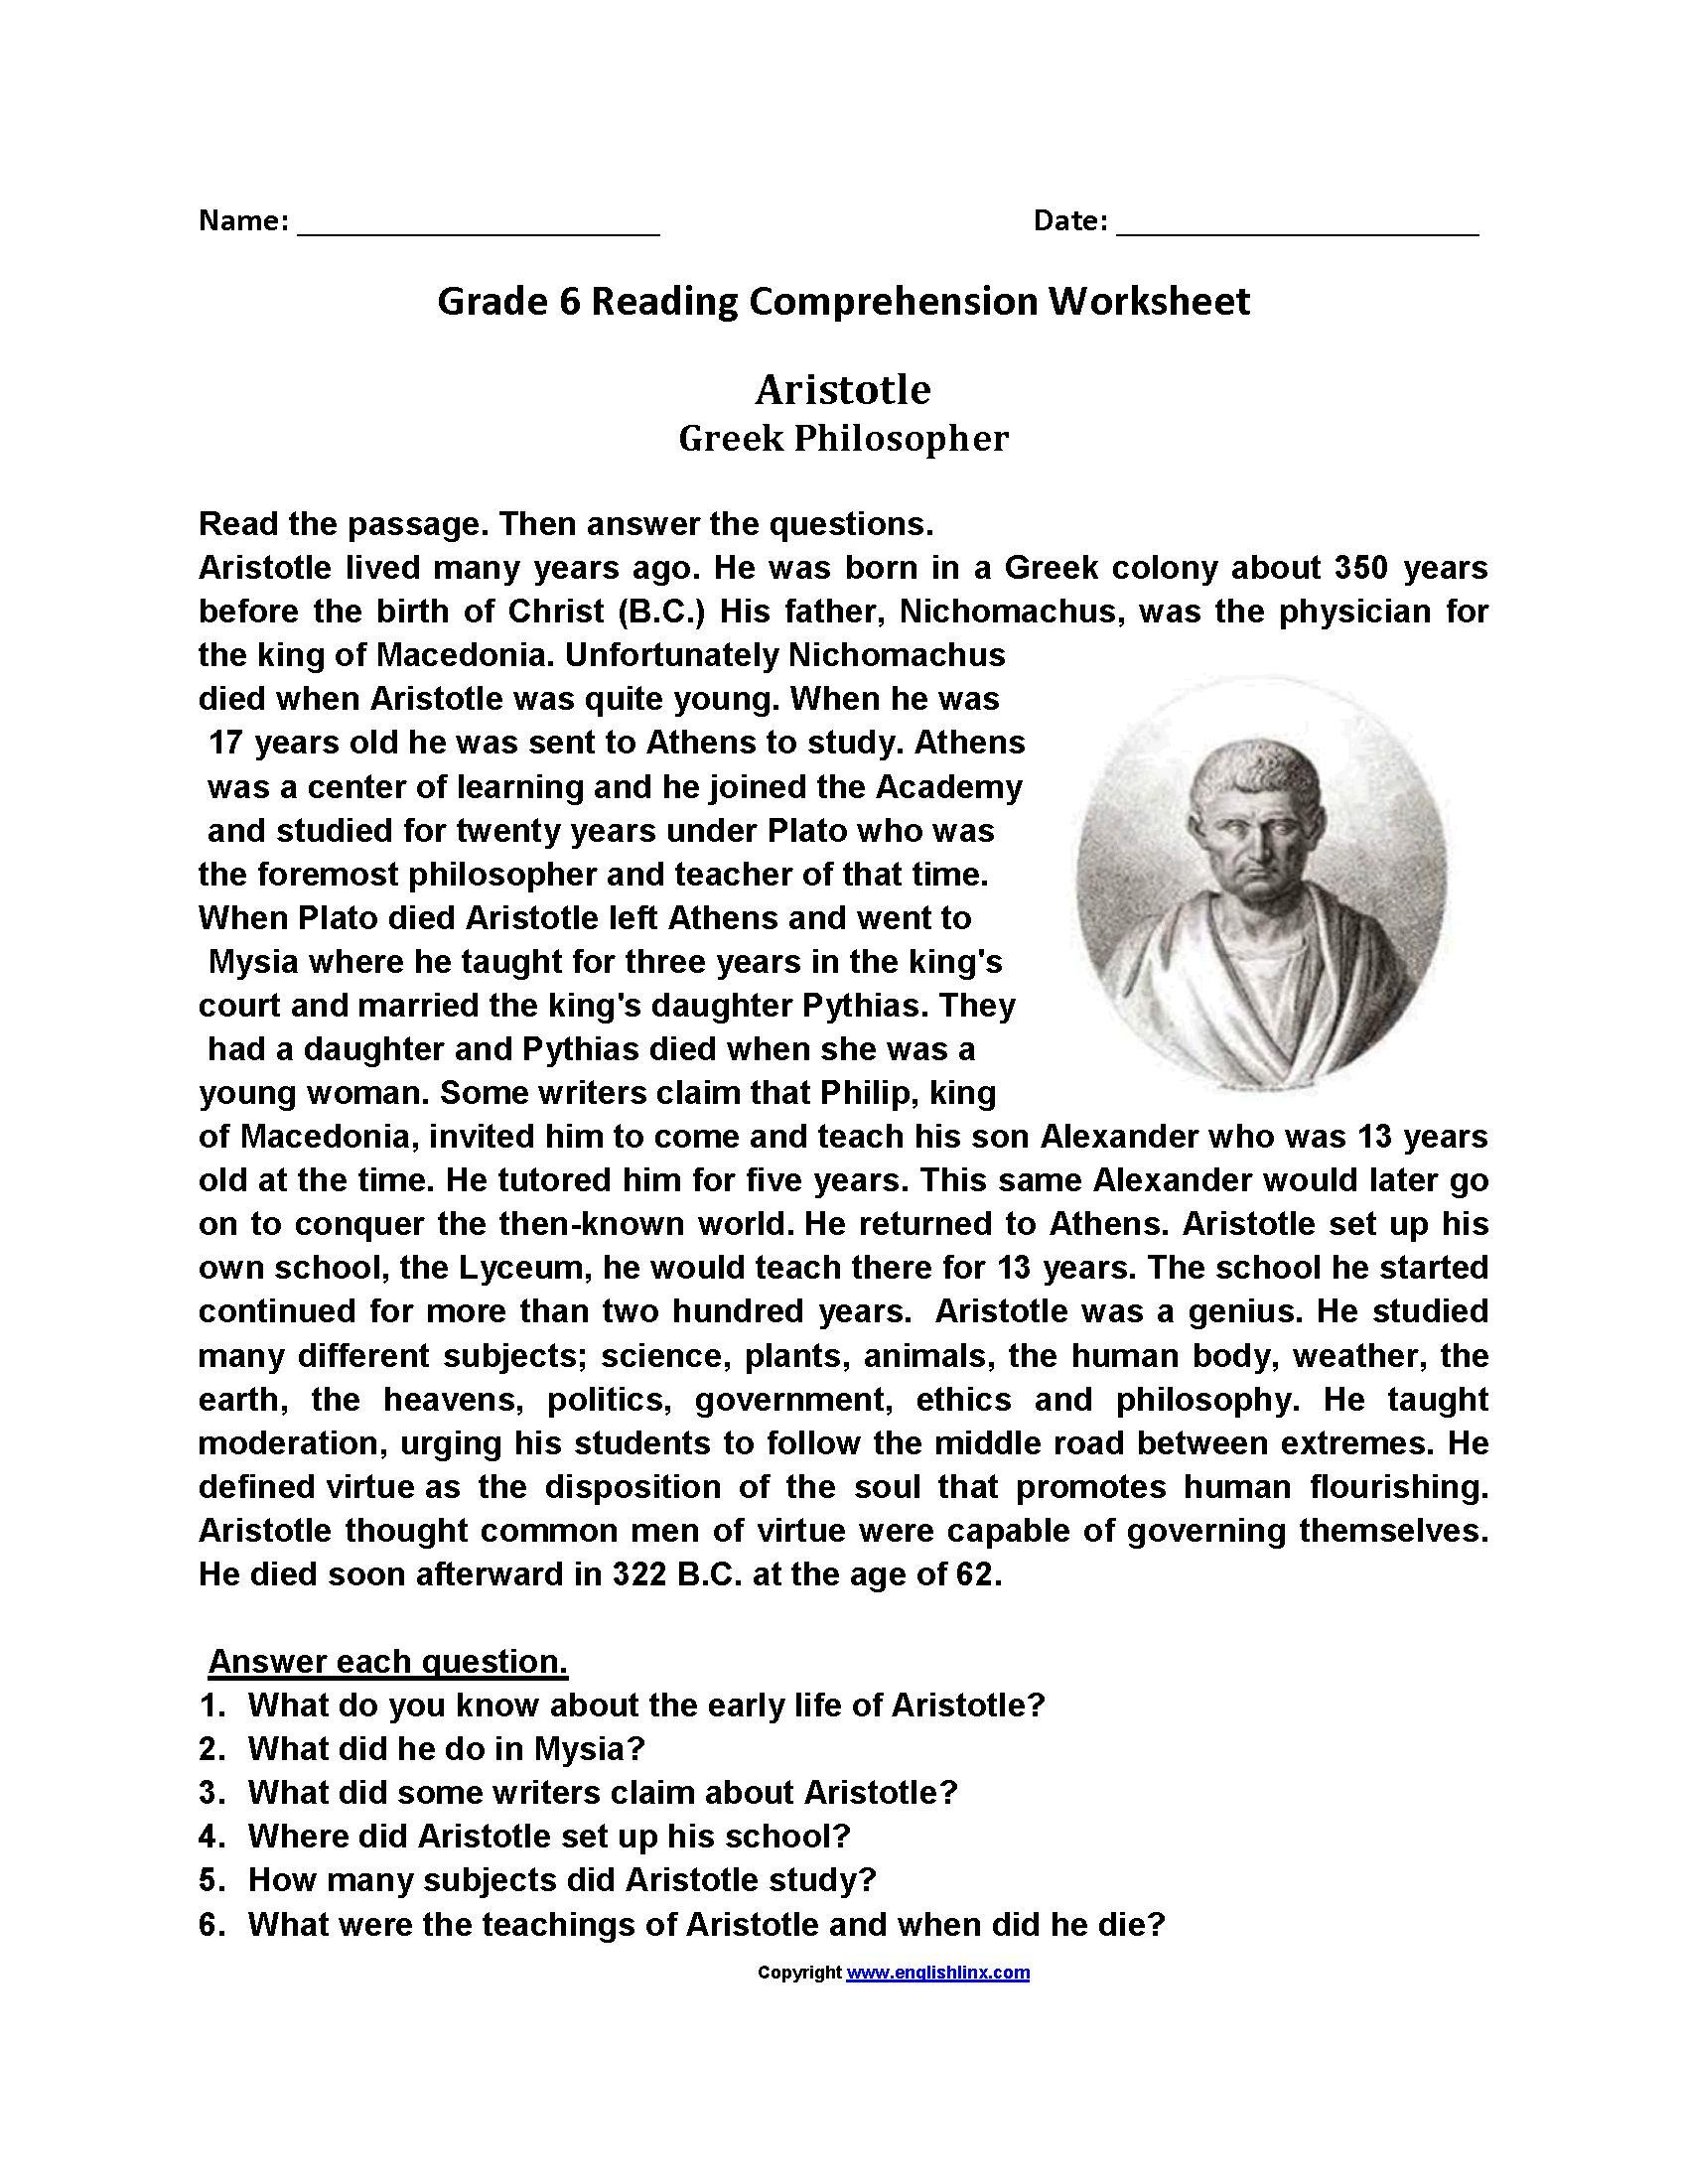 Free Printable Reading Worksheets For Grade 6 Letter